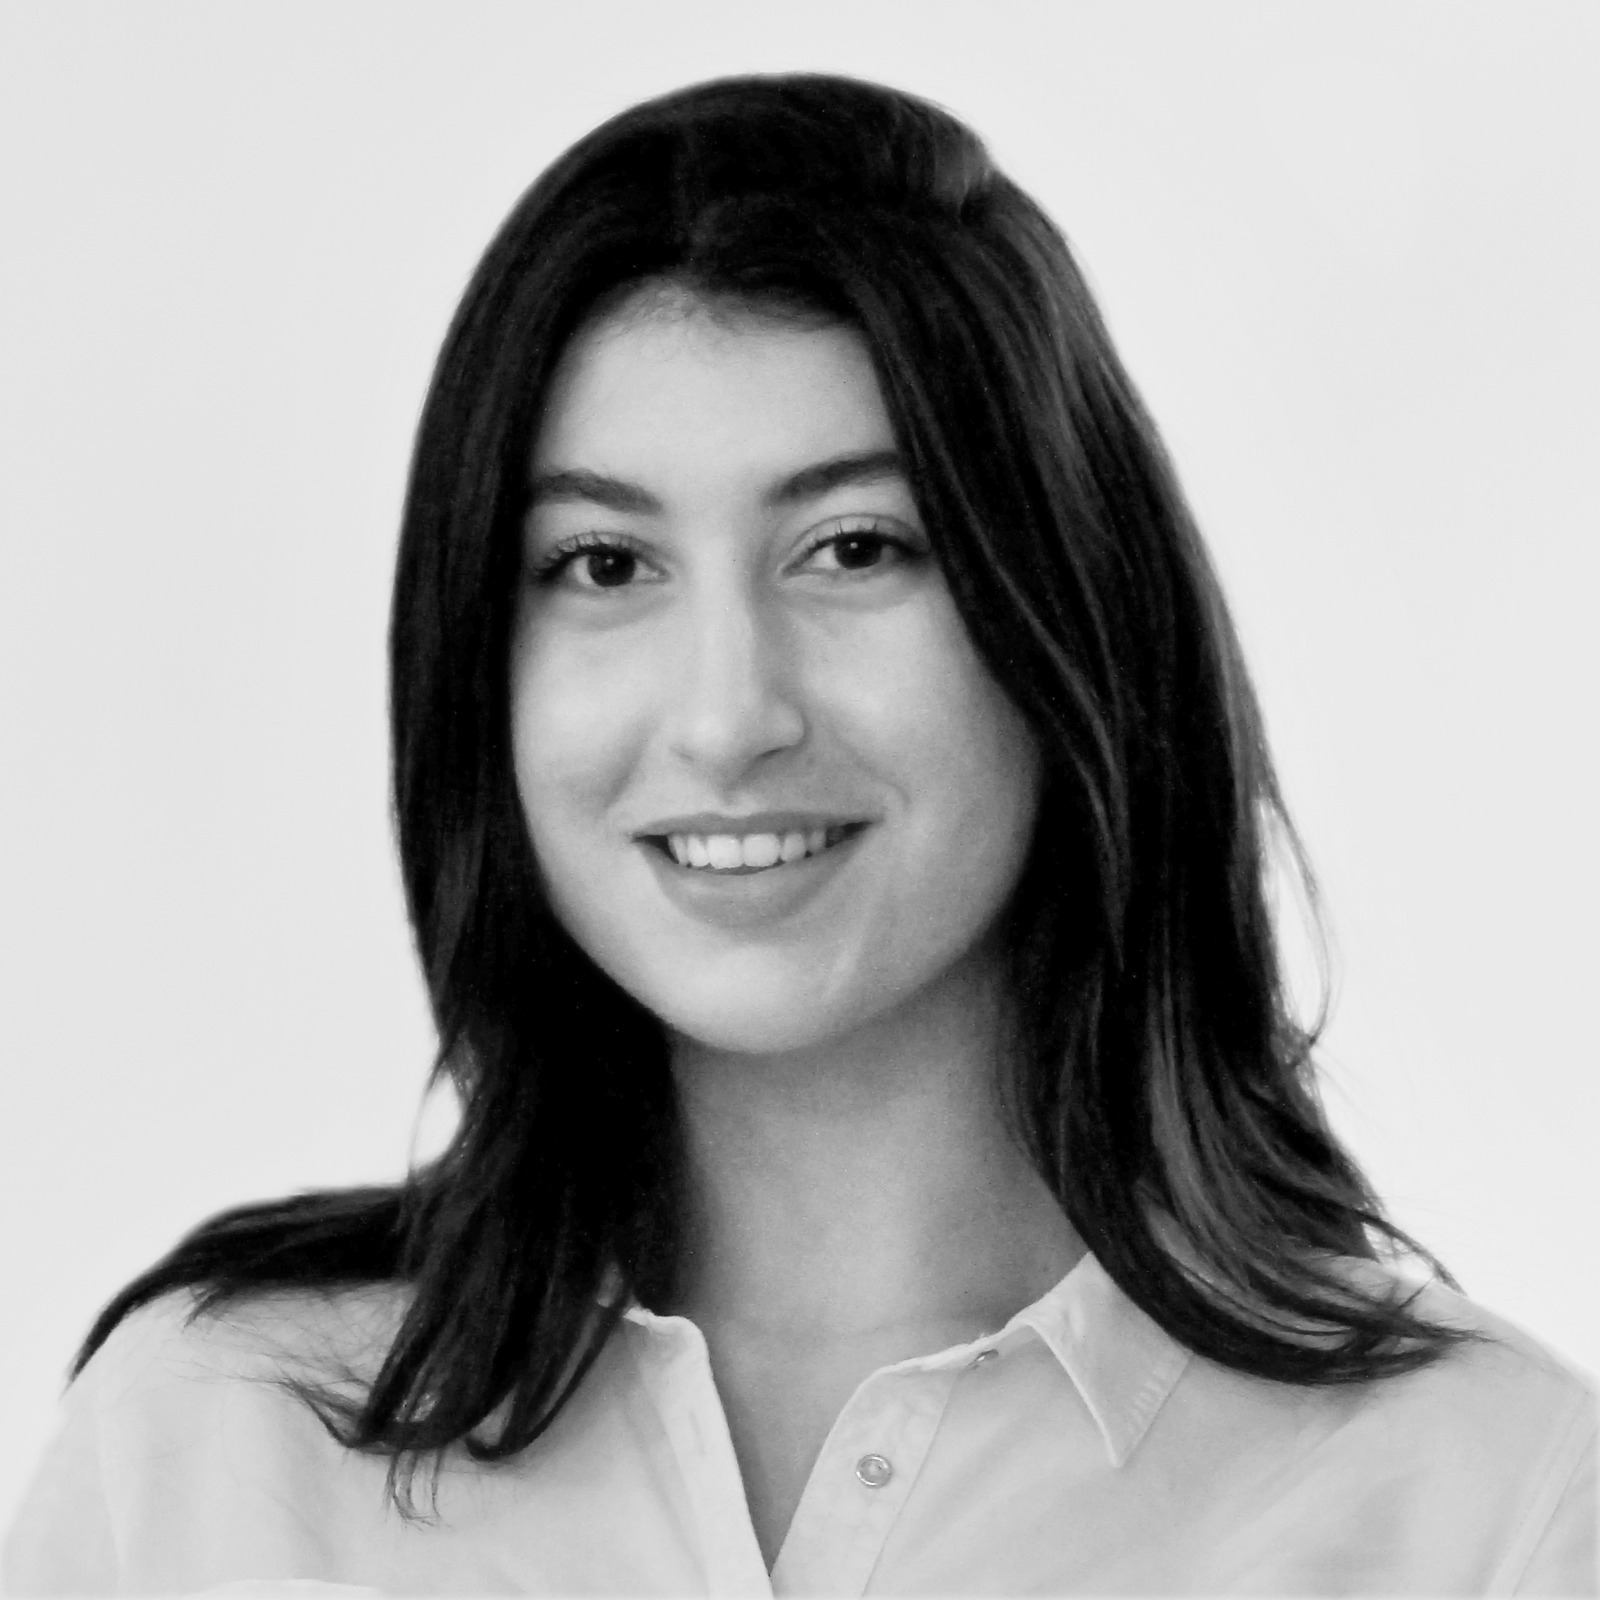 https://ksrarchitects.com/wp-content/uploads/2021/06/Katarina-Manojlovic.jpg